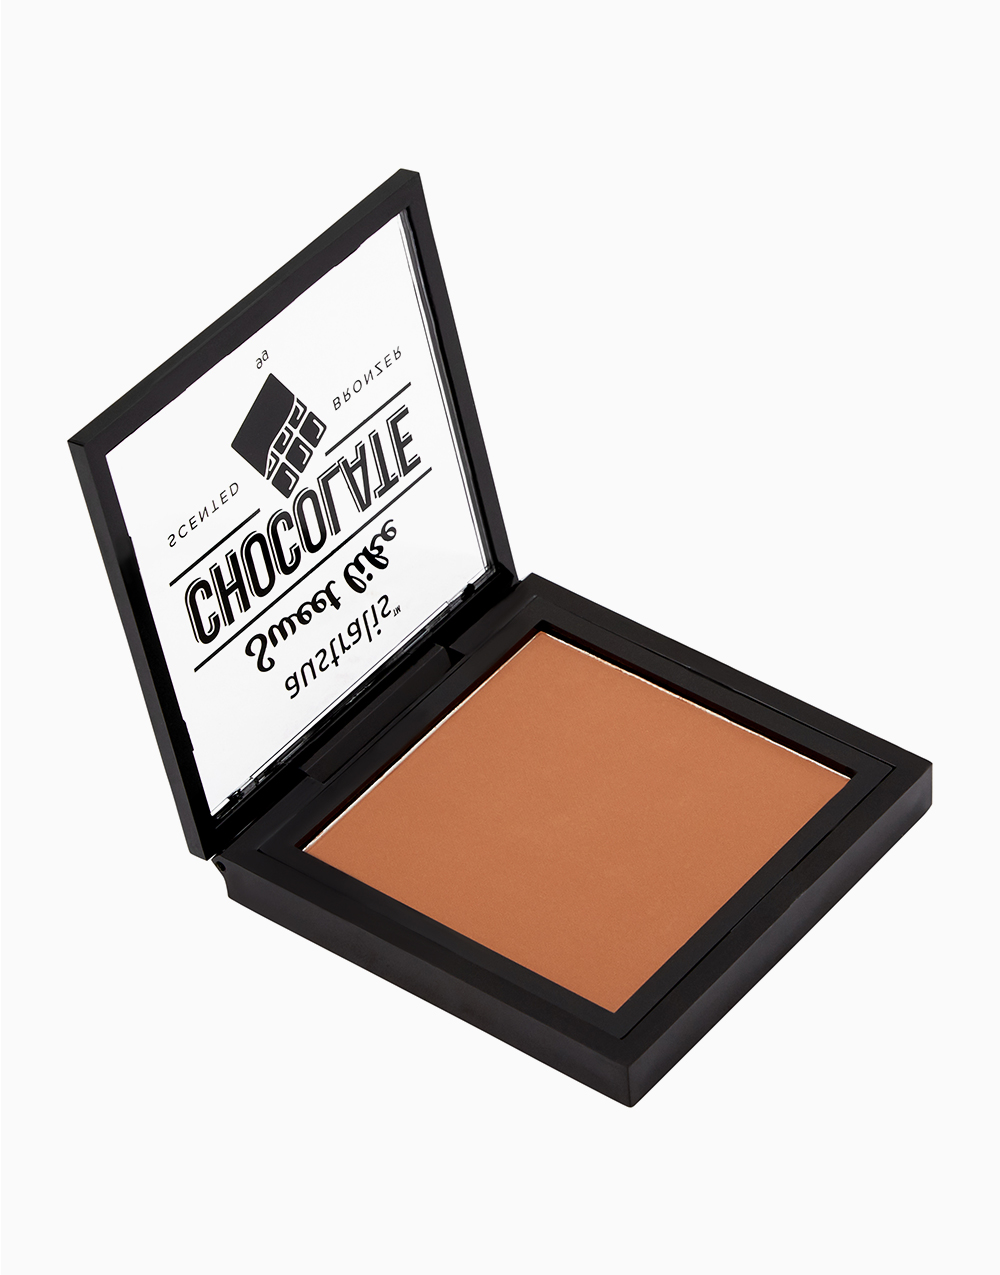 Sweet Like Chocolate Bronzer by Australis | Ganache Gold